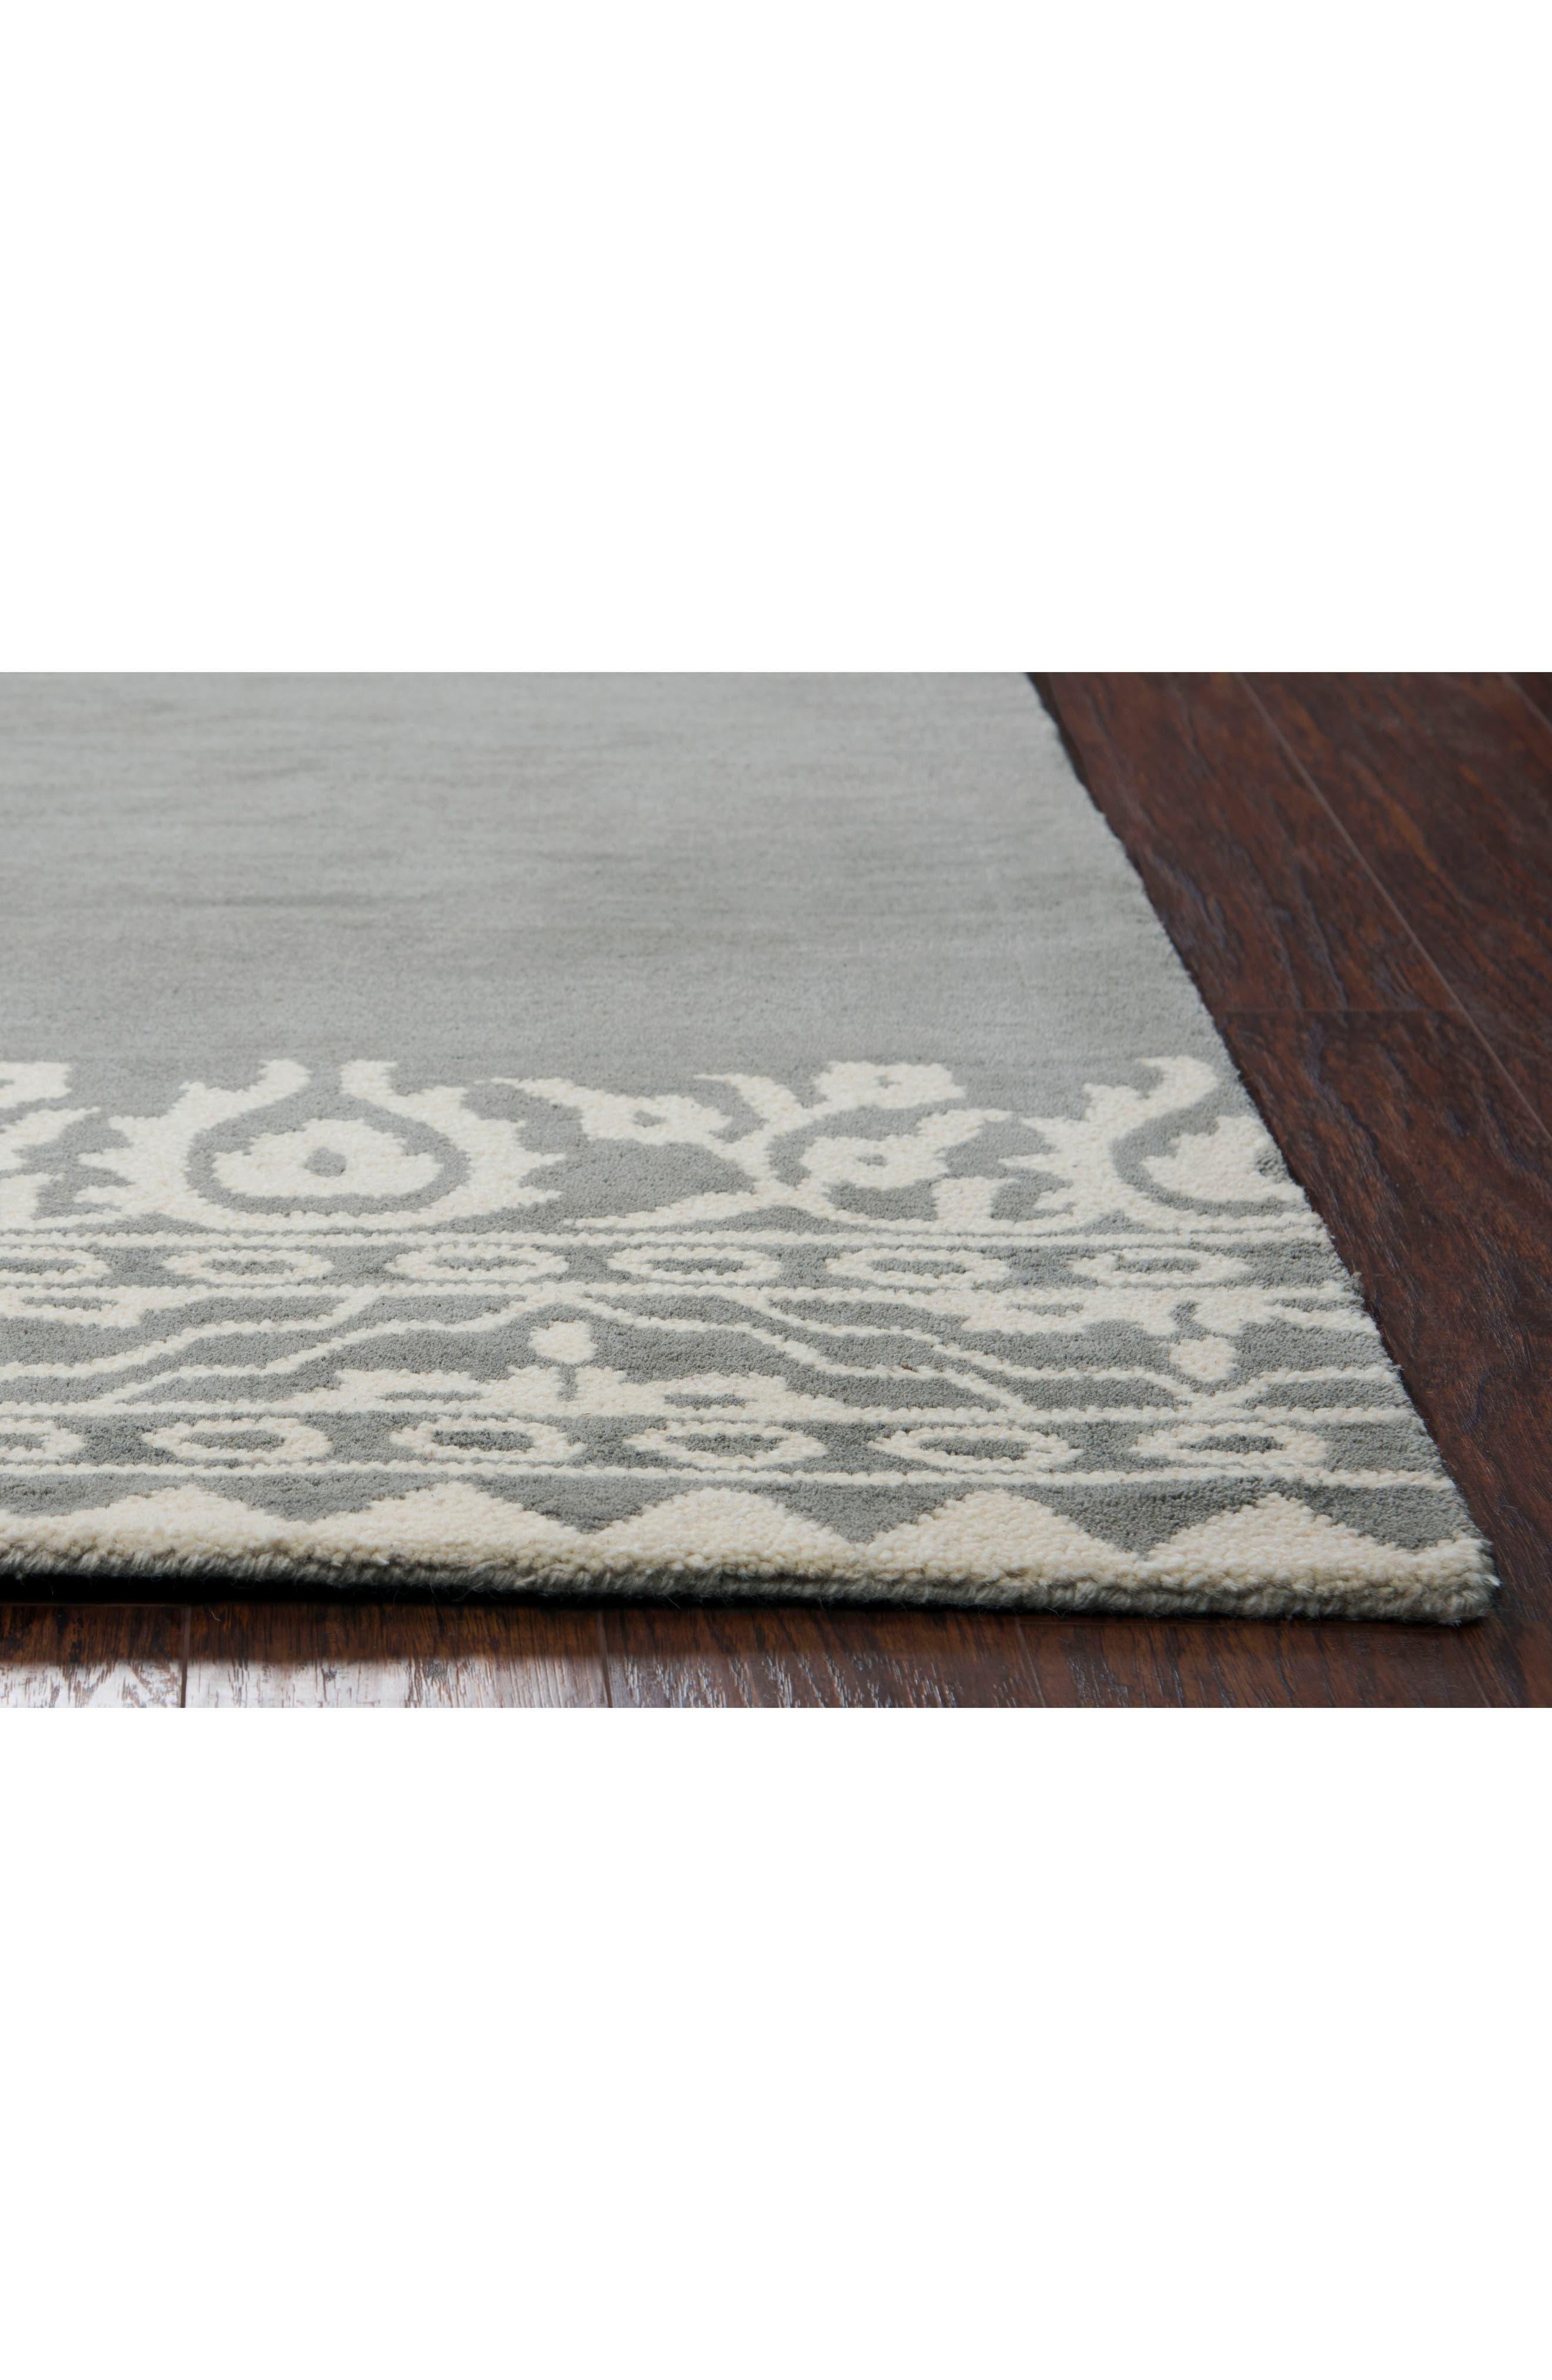 Framed Medallion Hand Tufted Wool Area Rug,                             Alternate thumbnail 5, color,